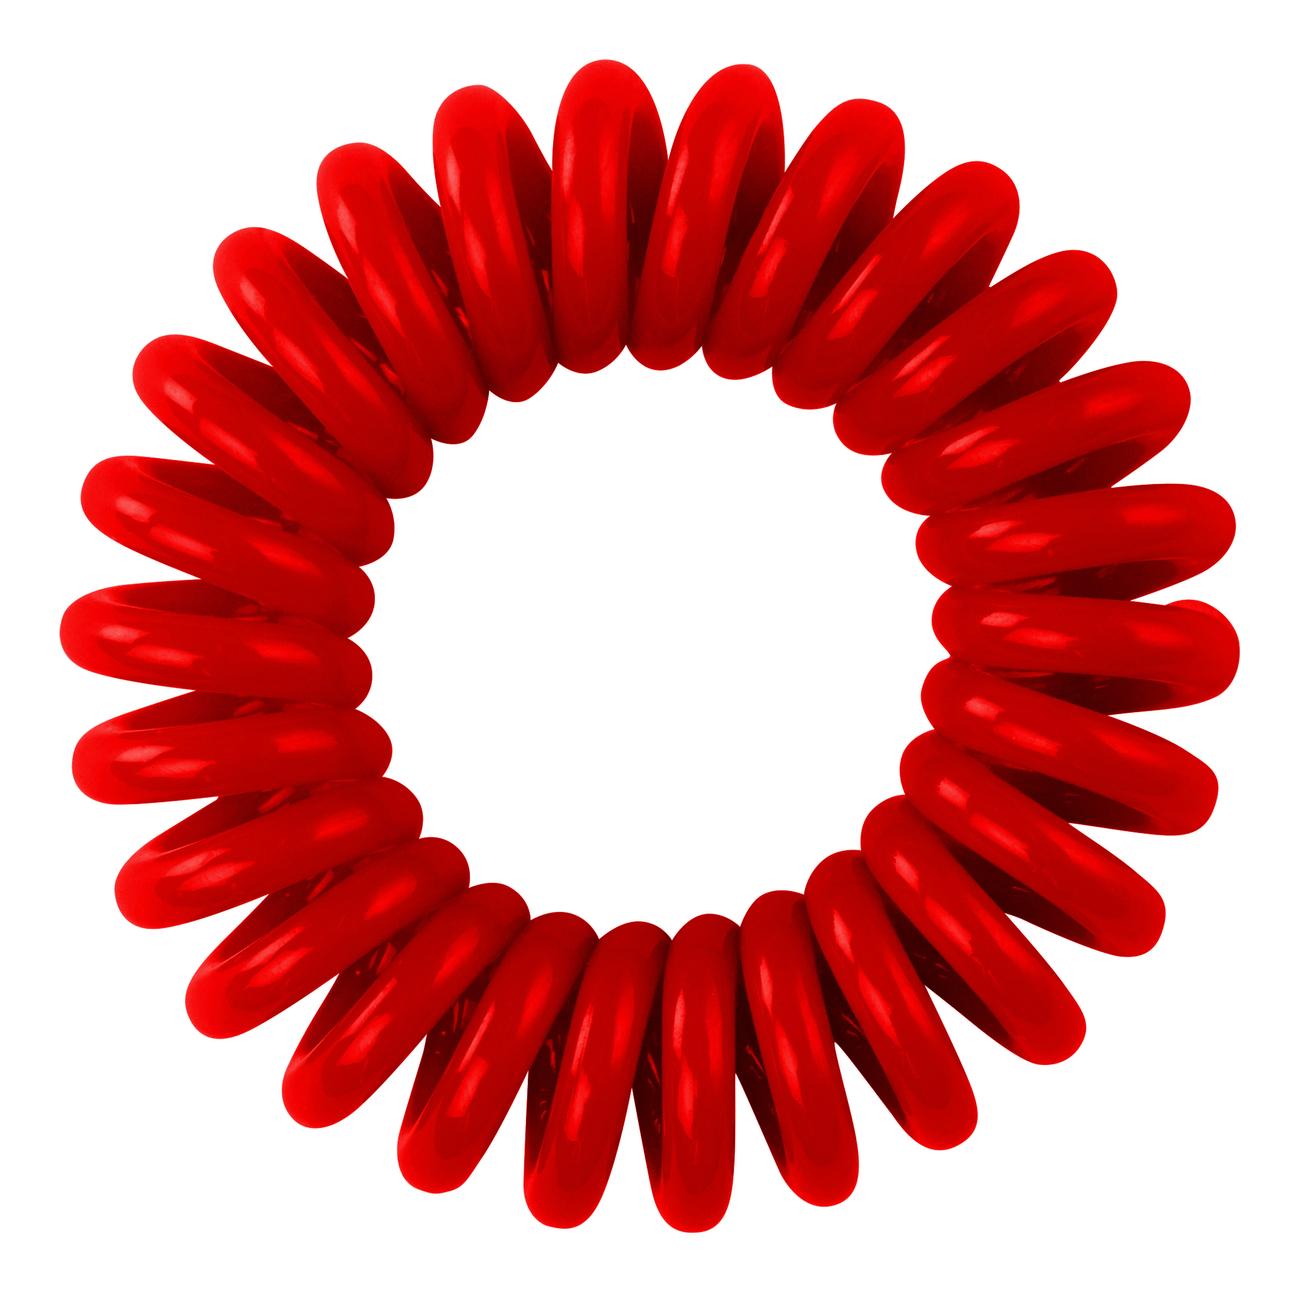 Резинка для волос Hair Bobbles (красная) 3шт резинка для волос black chocolate 3шт черная